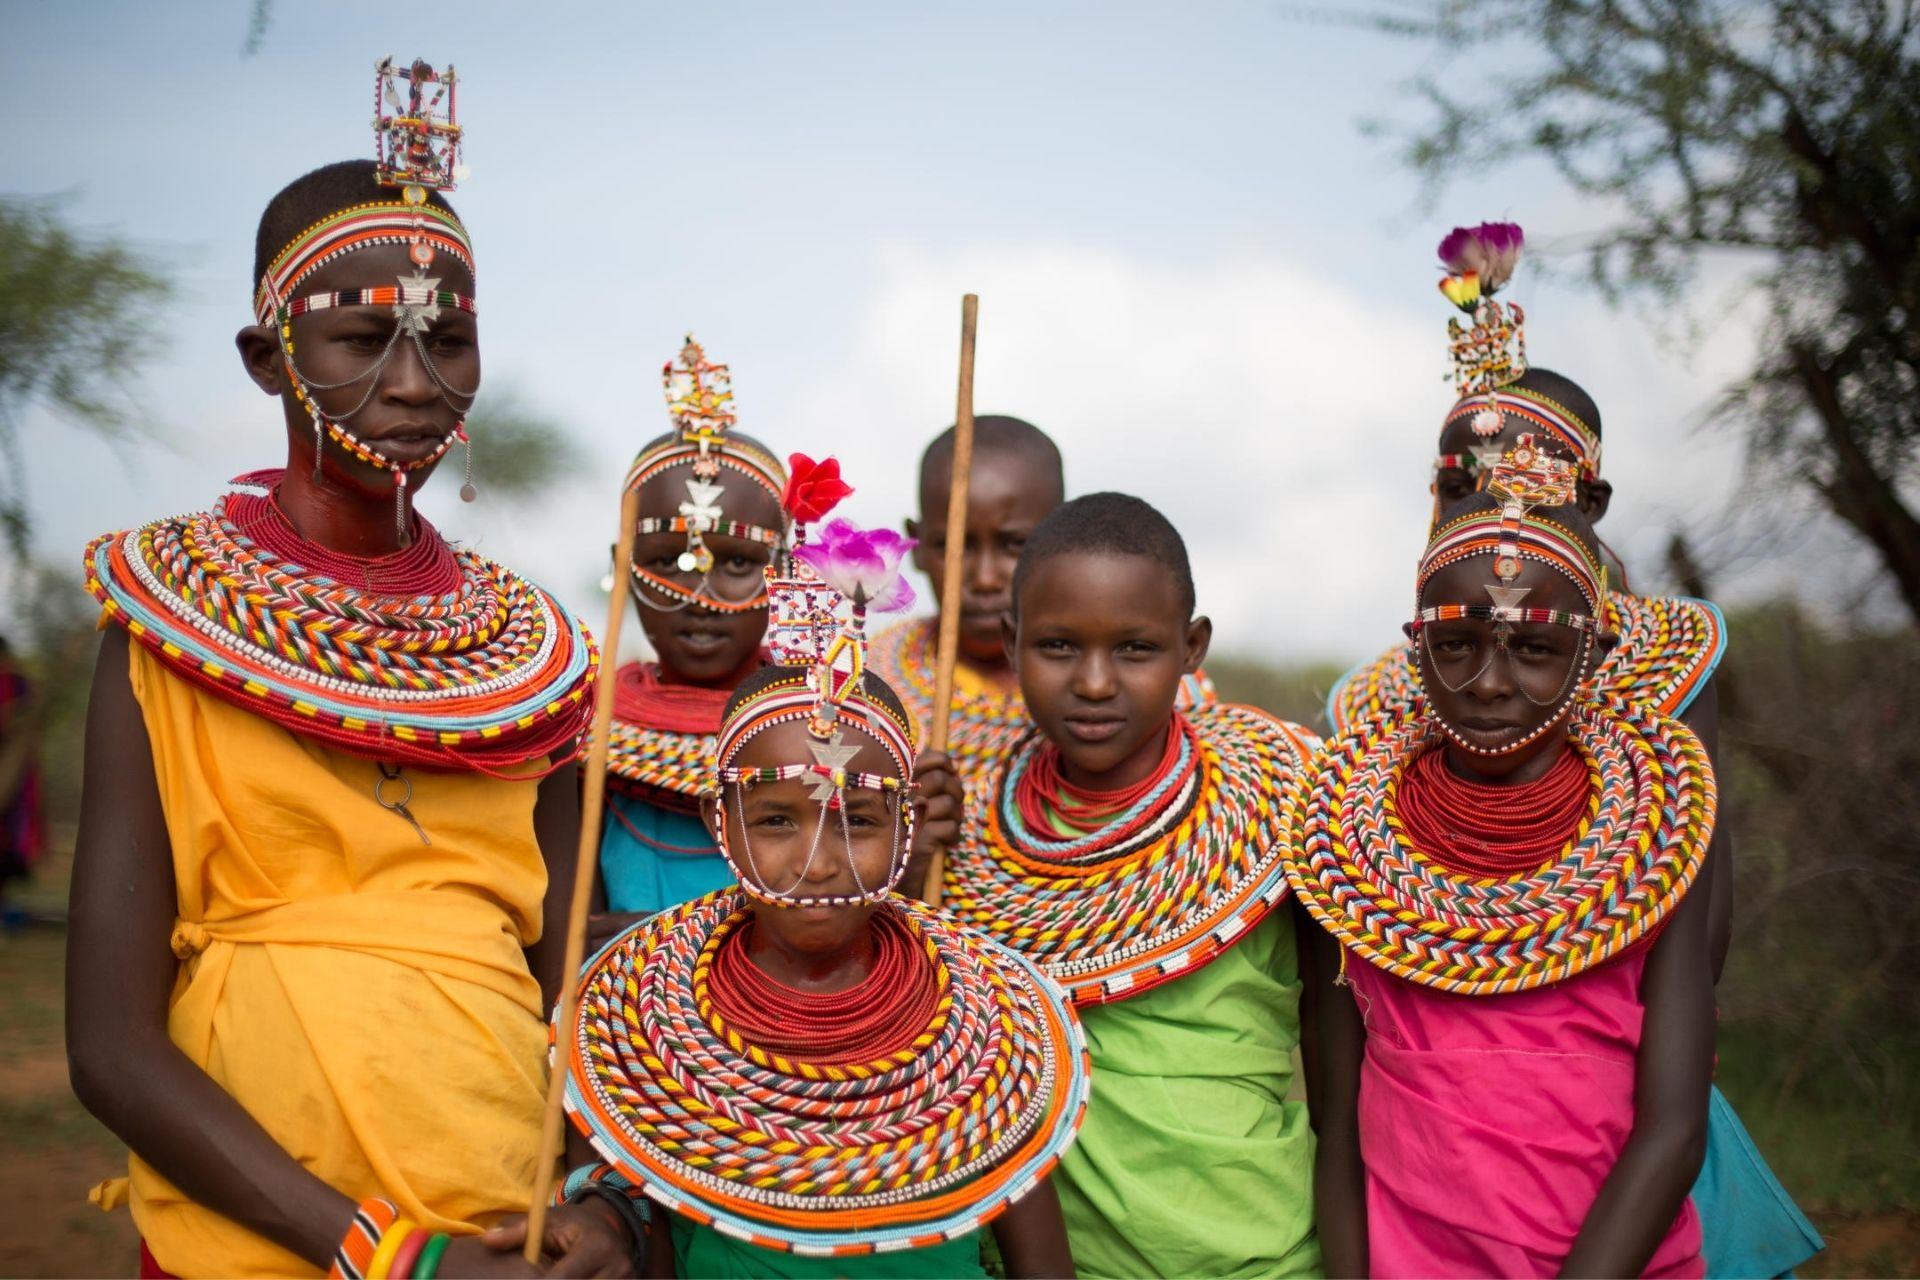 Loisaba Cultural visit